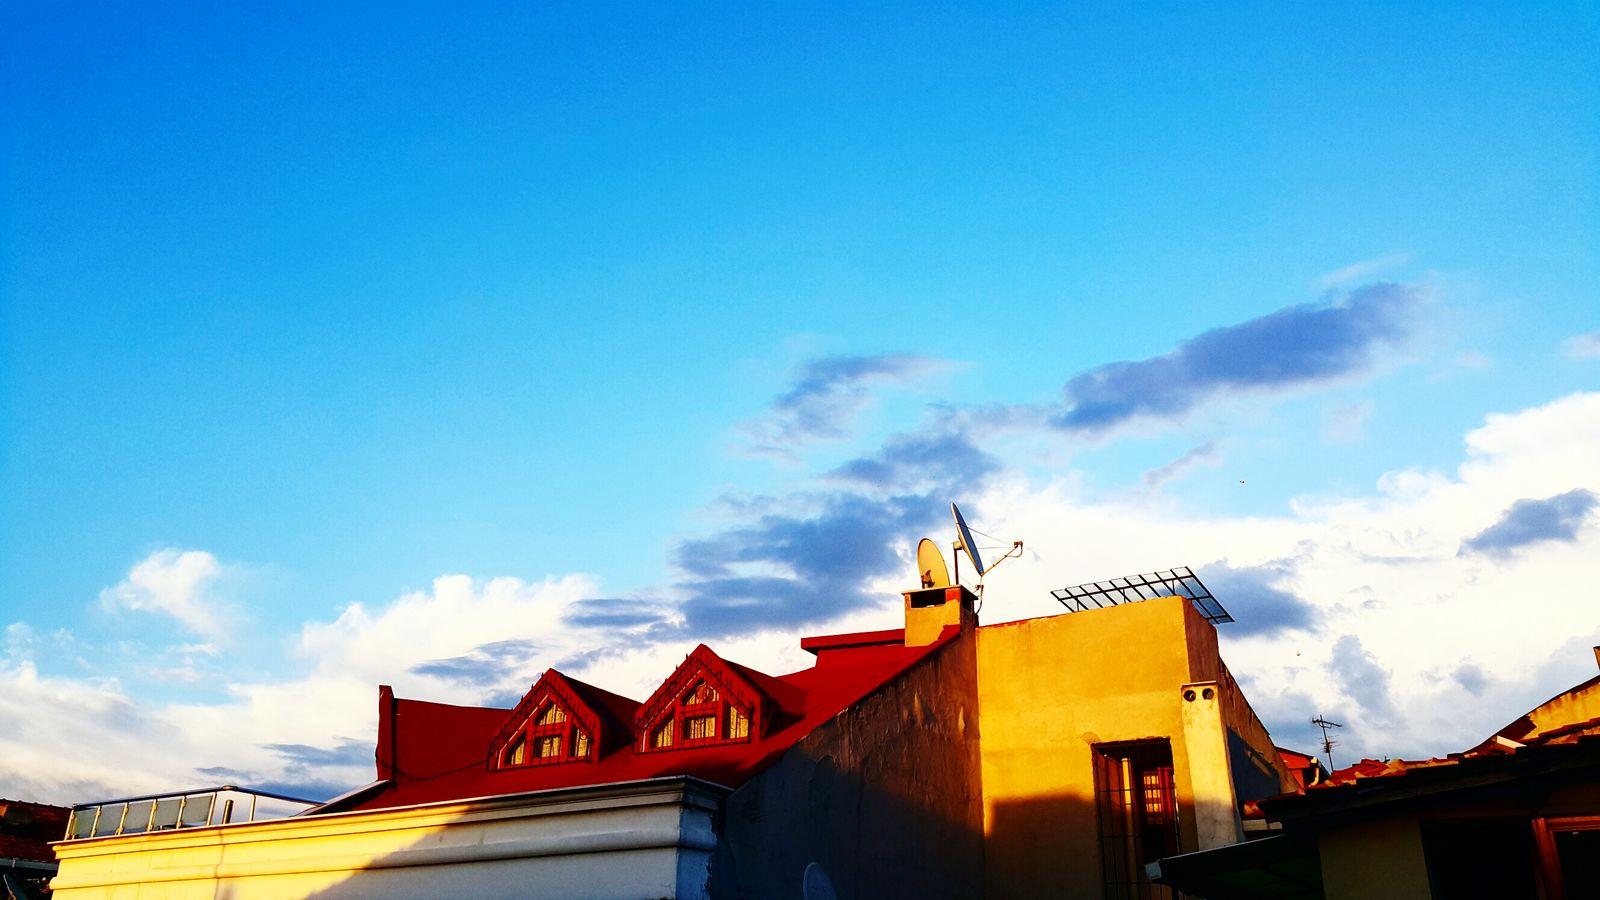 Bewild Blue Visualsoflife Livefolk Folkgood Kadrajımdan Soft Colors  Soft_vision Nature Cloud Cloud - Sky Kadrajimdan Turkey Istanbul  Sky_ Collection No People Beauty In Nature First Eyeem Photo Soft Colors  Kadrajturkiye Naturephotography ☁☁☁